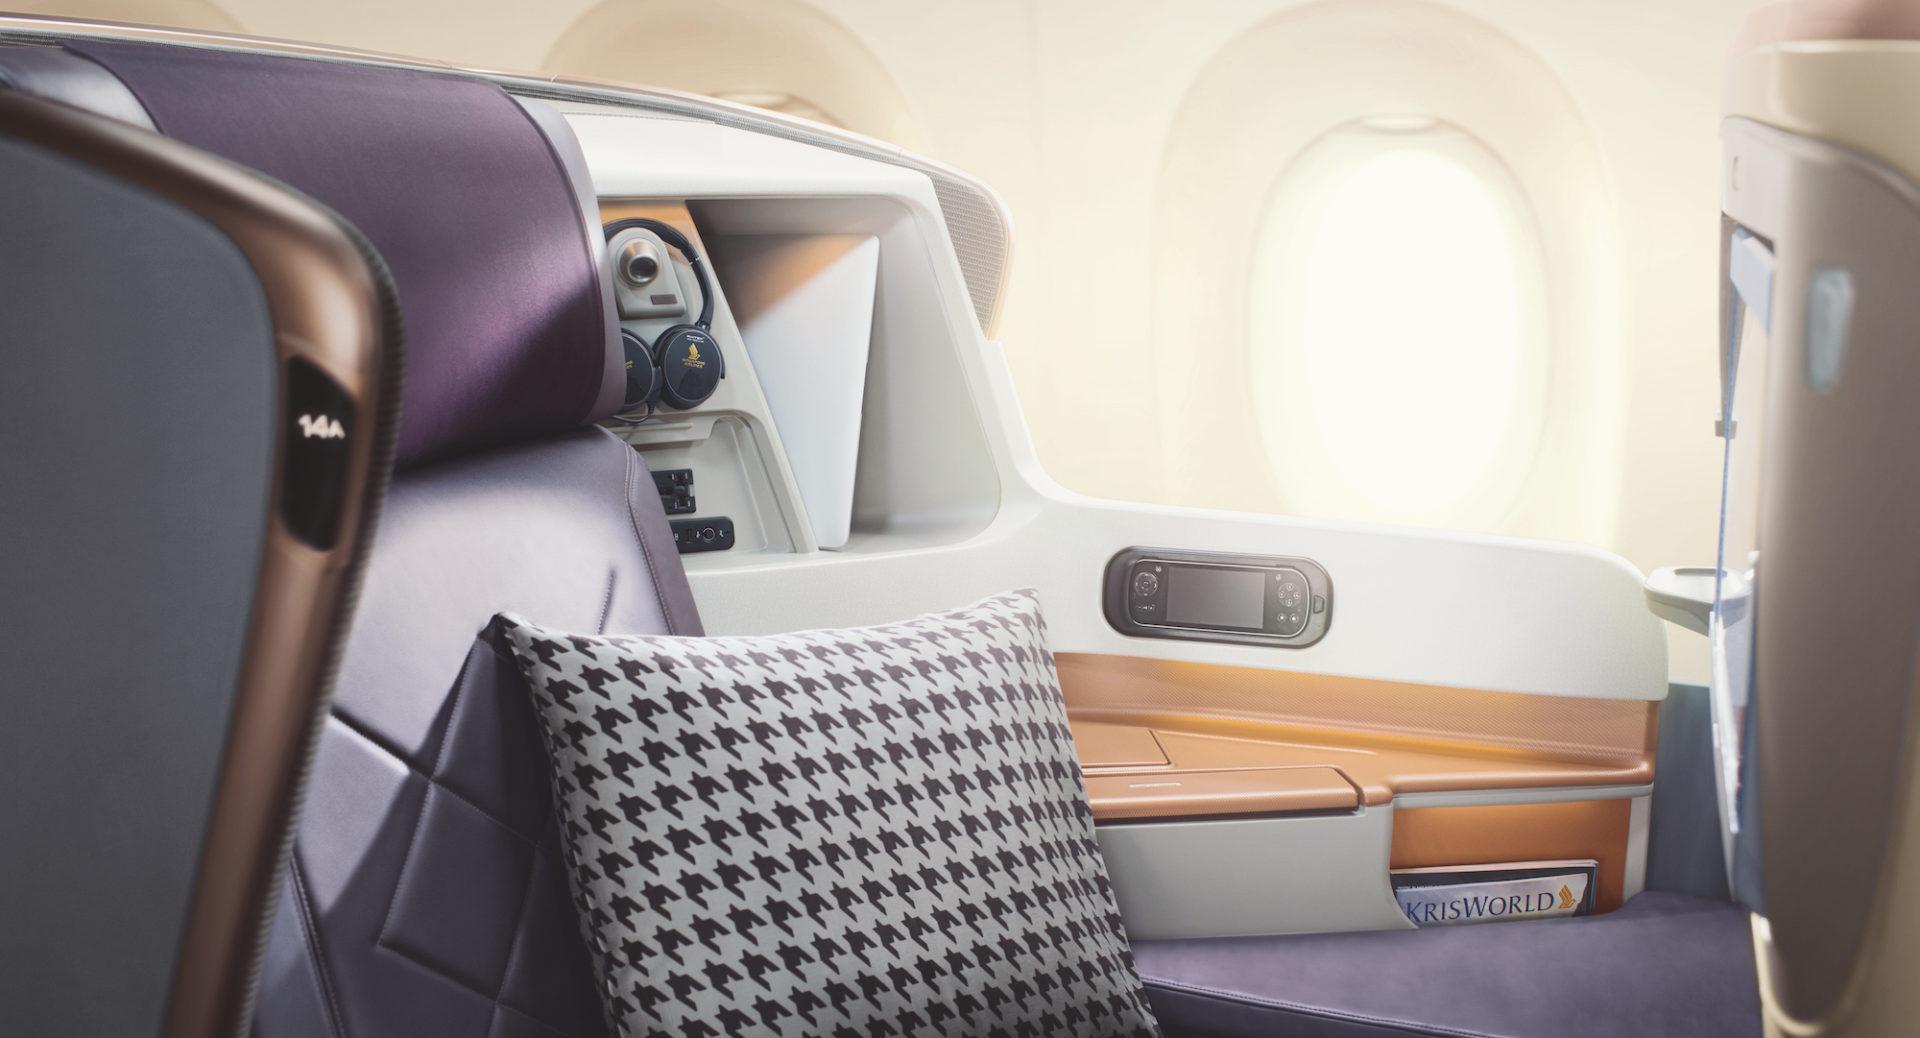 Singapore Airlines Business Class poduszki